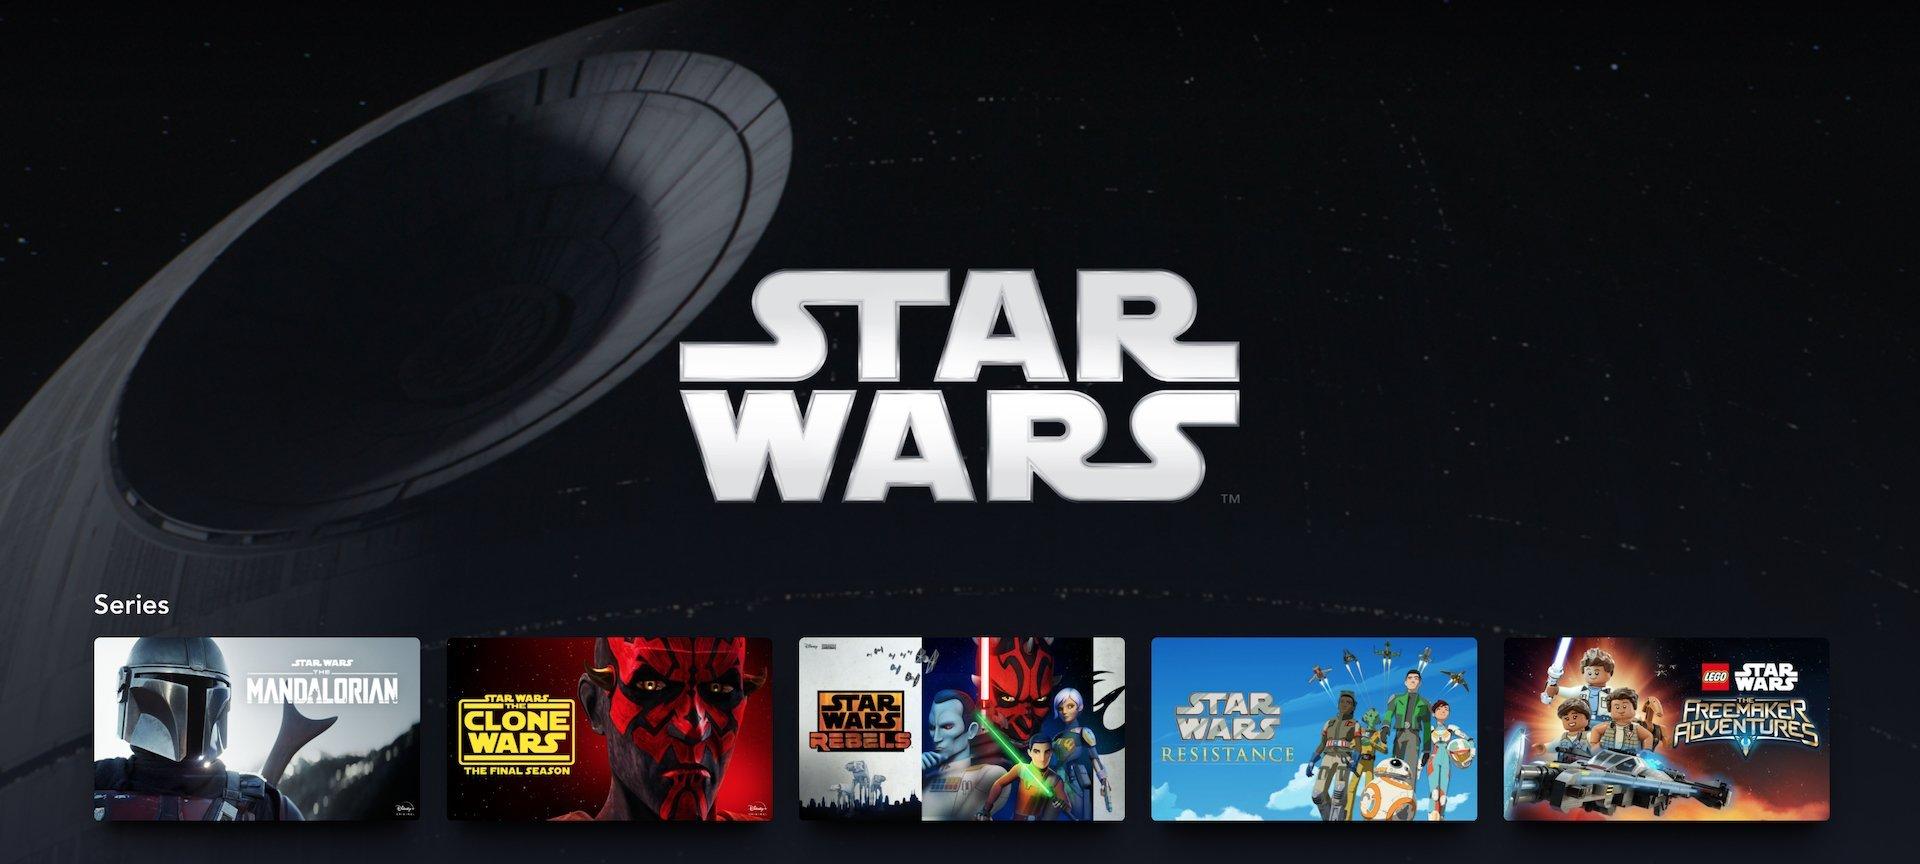 Star Wars: in arrivo una nuova serie Disney+ firmata da Leslye Headland